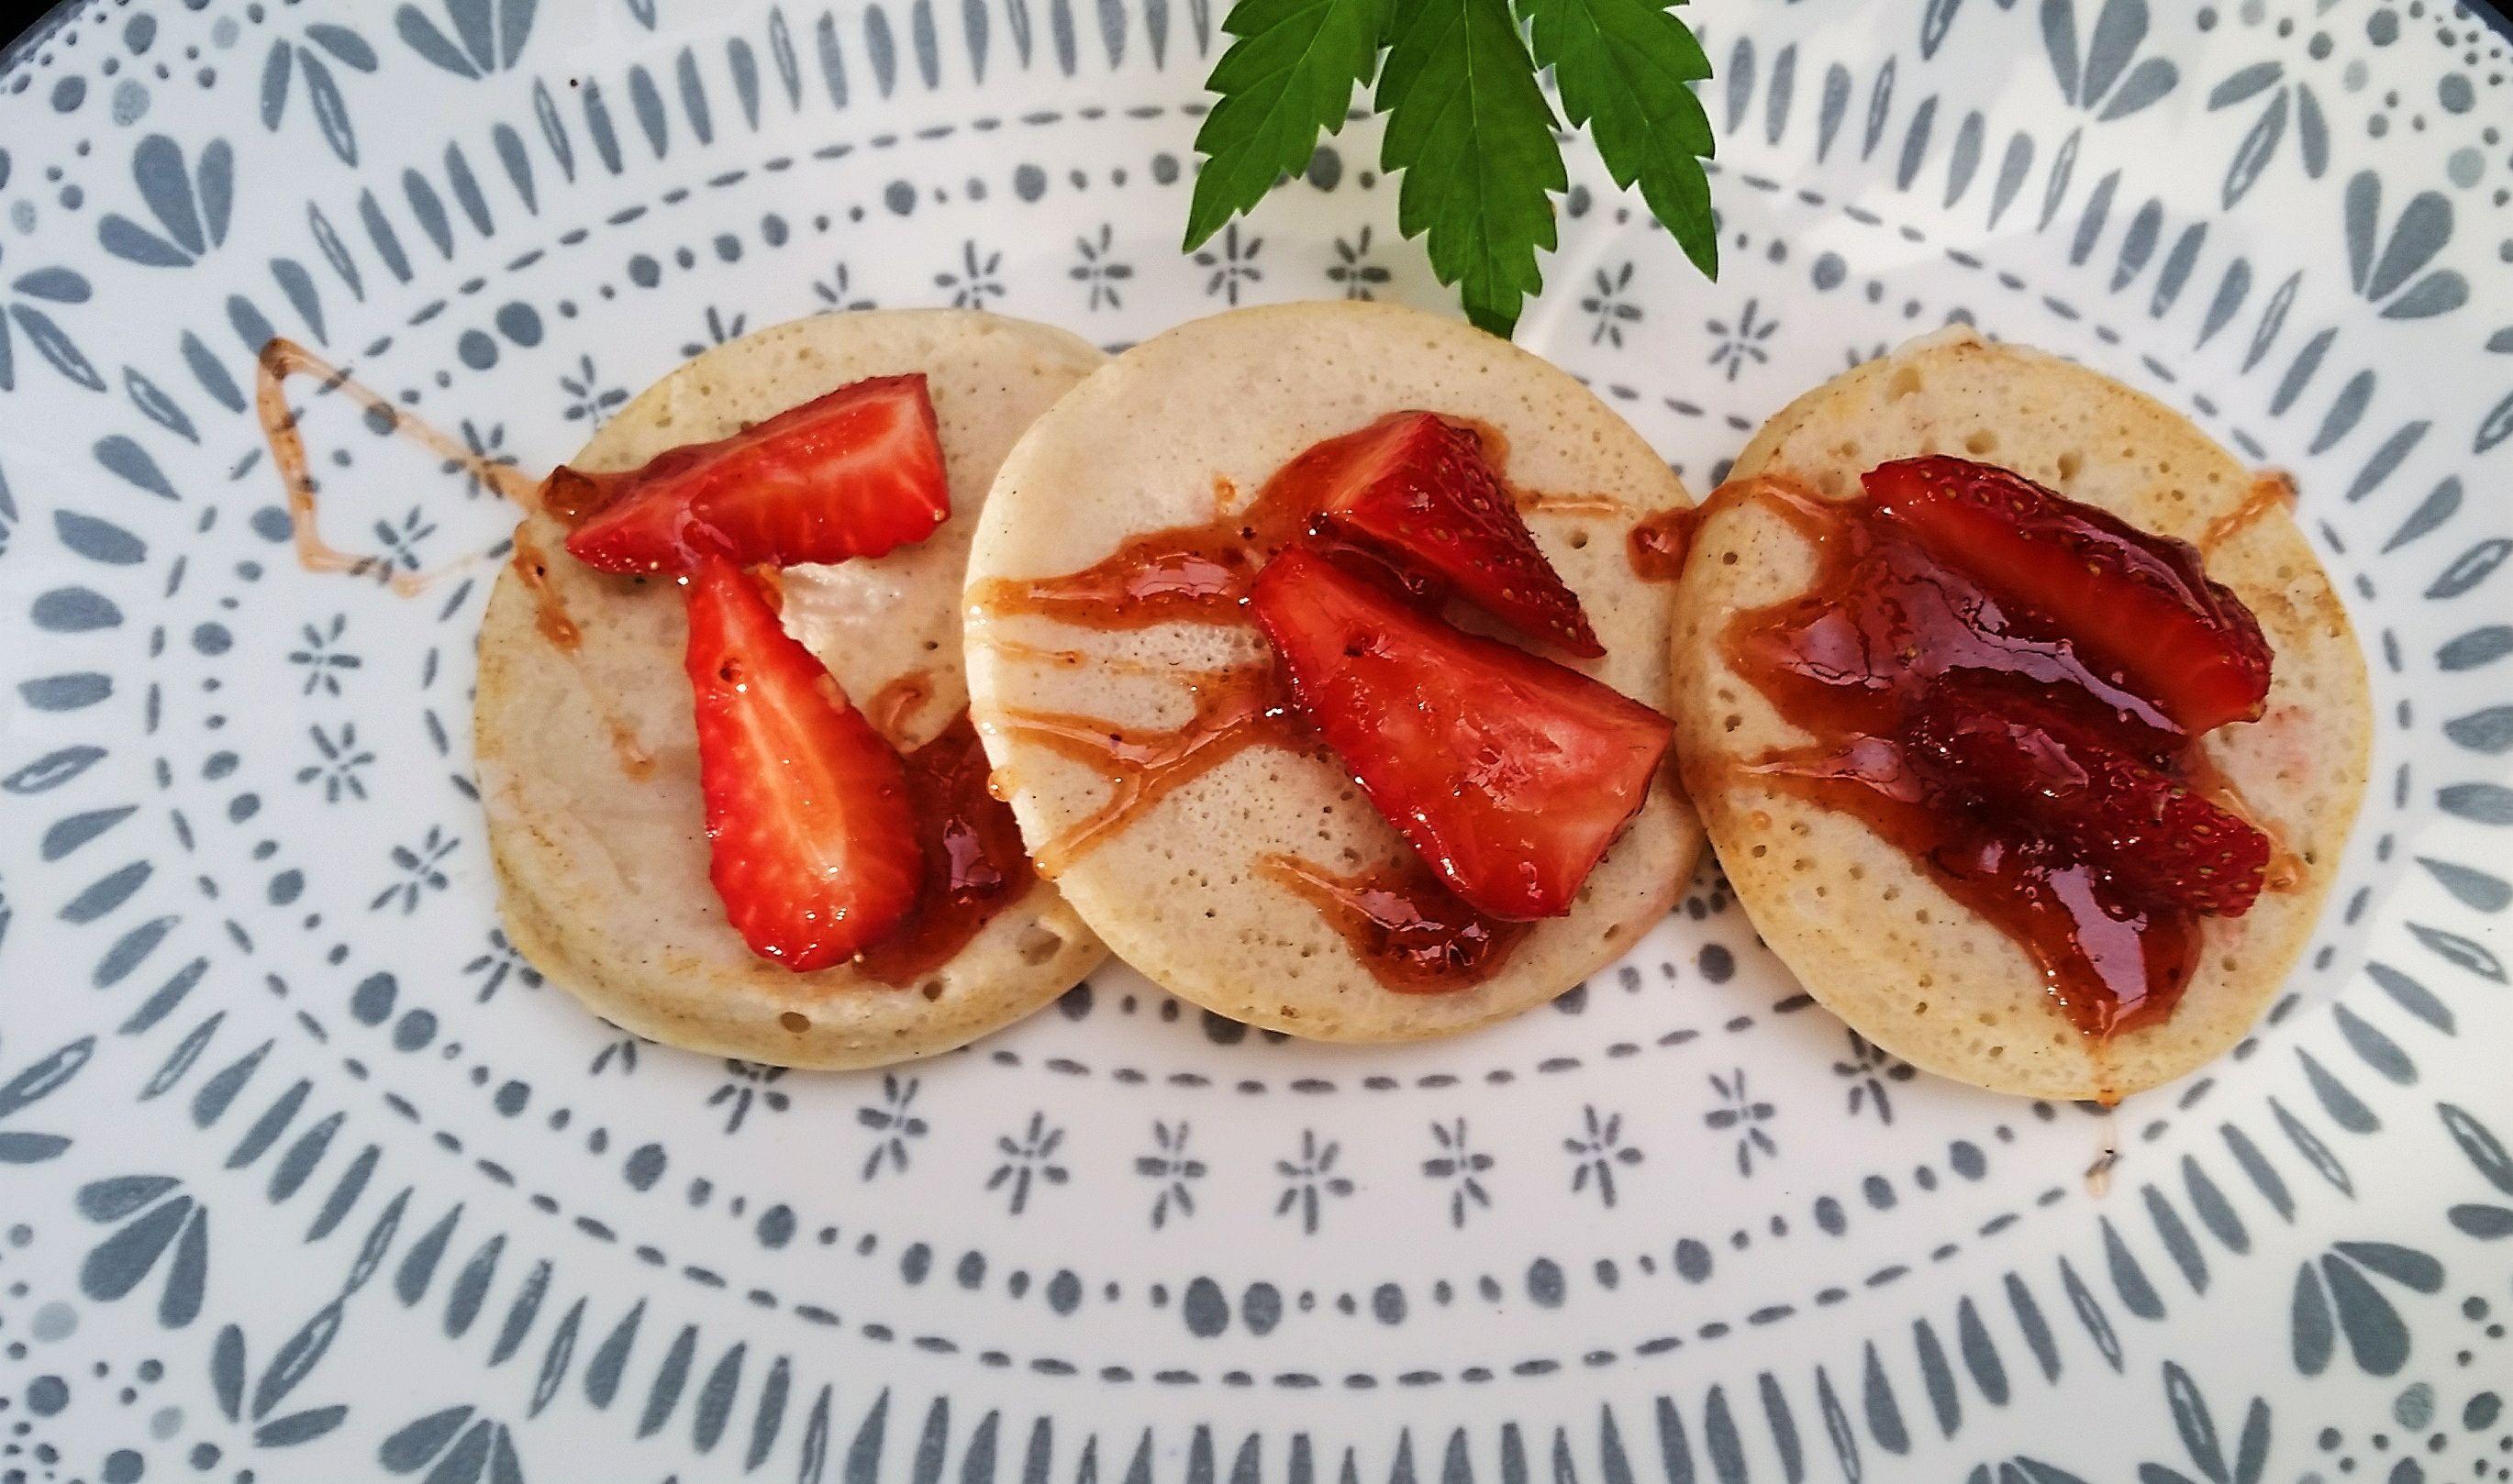 Ohh yeah lovely best high protein plant based HEMPlified pancakes ... Using a blend of rice and buckwheat flours blended with coconut cream and hemp mylk!   #hemp #hempseeds  #hempnutrition #hempfood #superfood #powerful #goodness #hempseeds #giveitago #trustinnature #gethemped #hemplove #gethempedoz #hempmylk